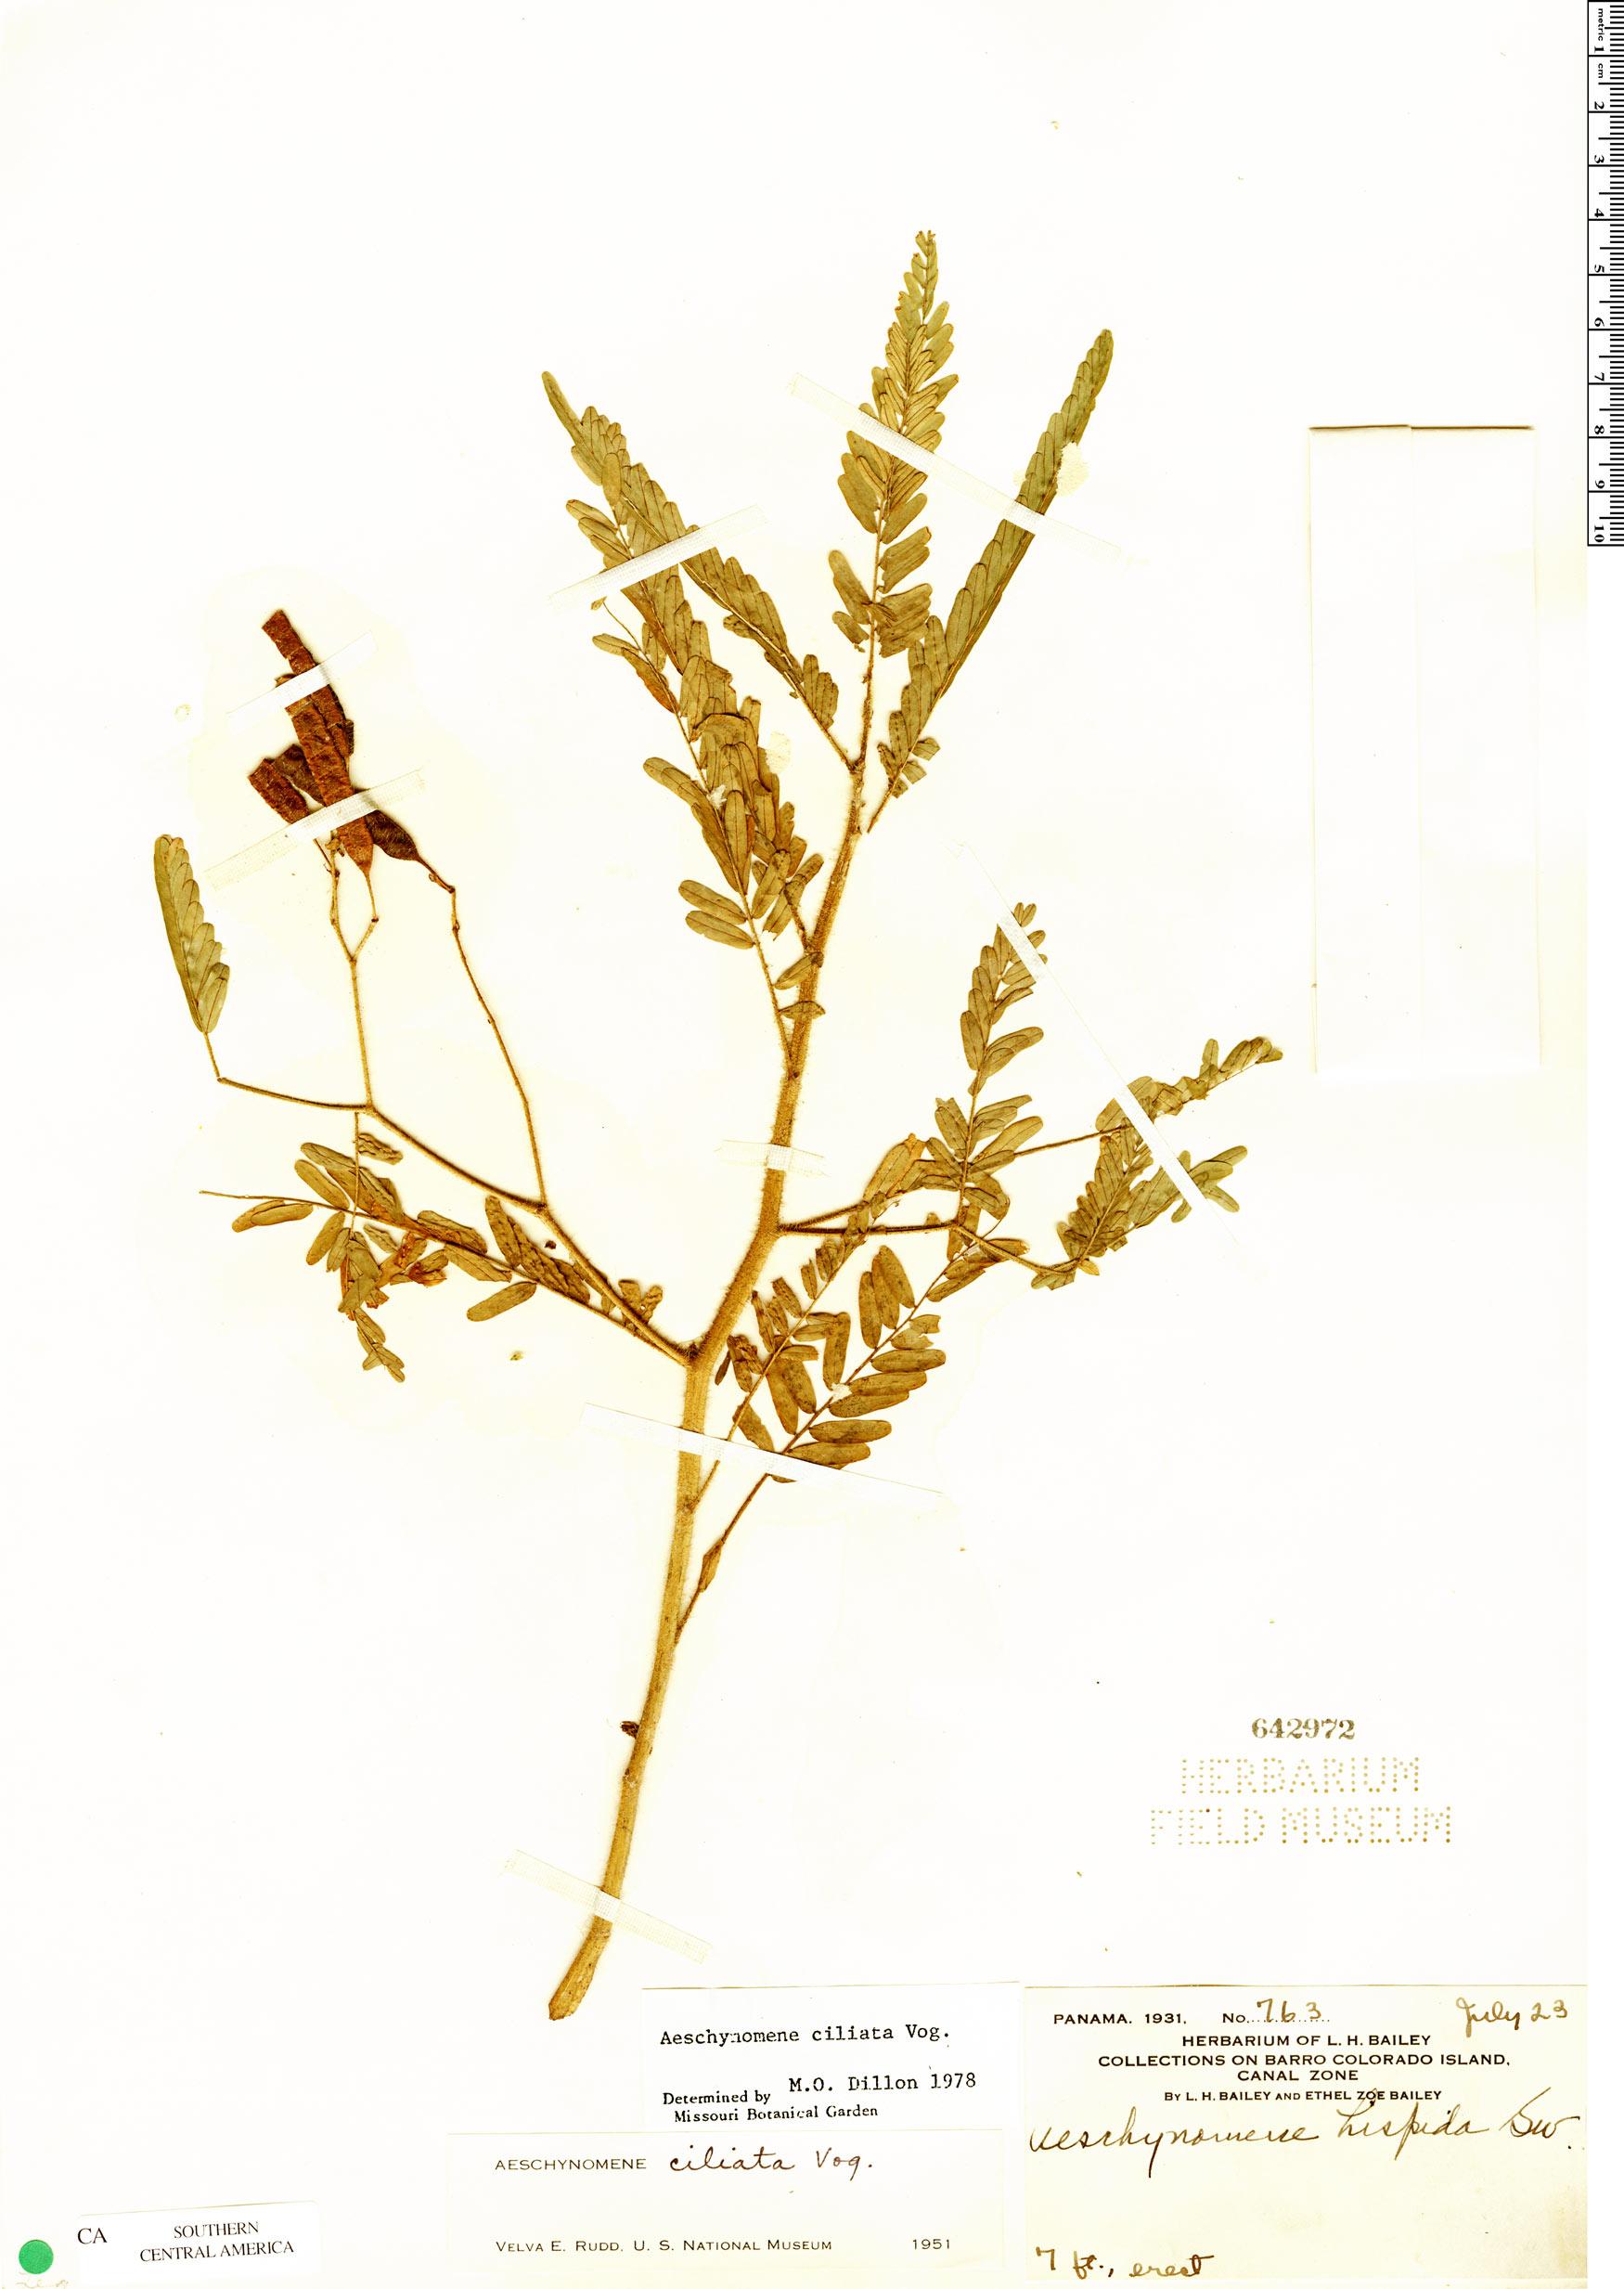 Specimen: Aeschynomene ciliata